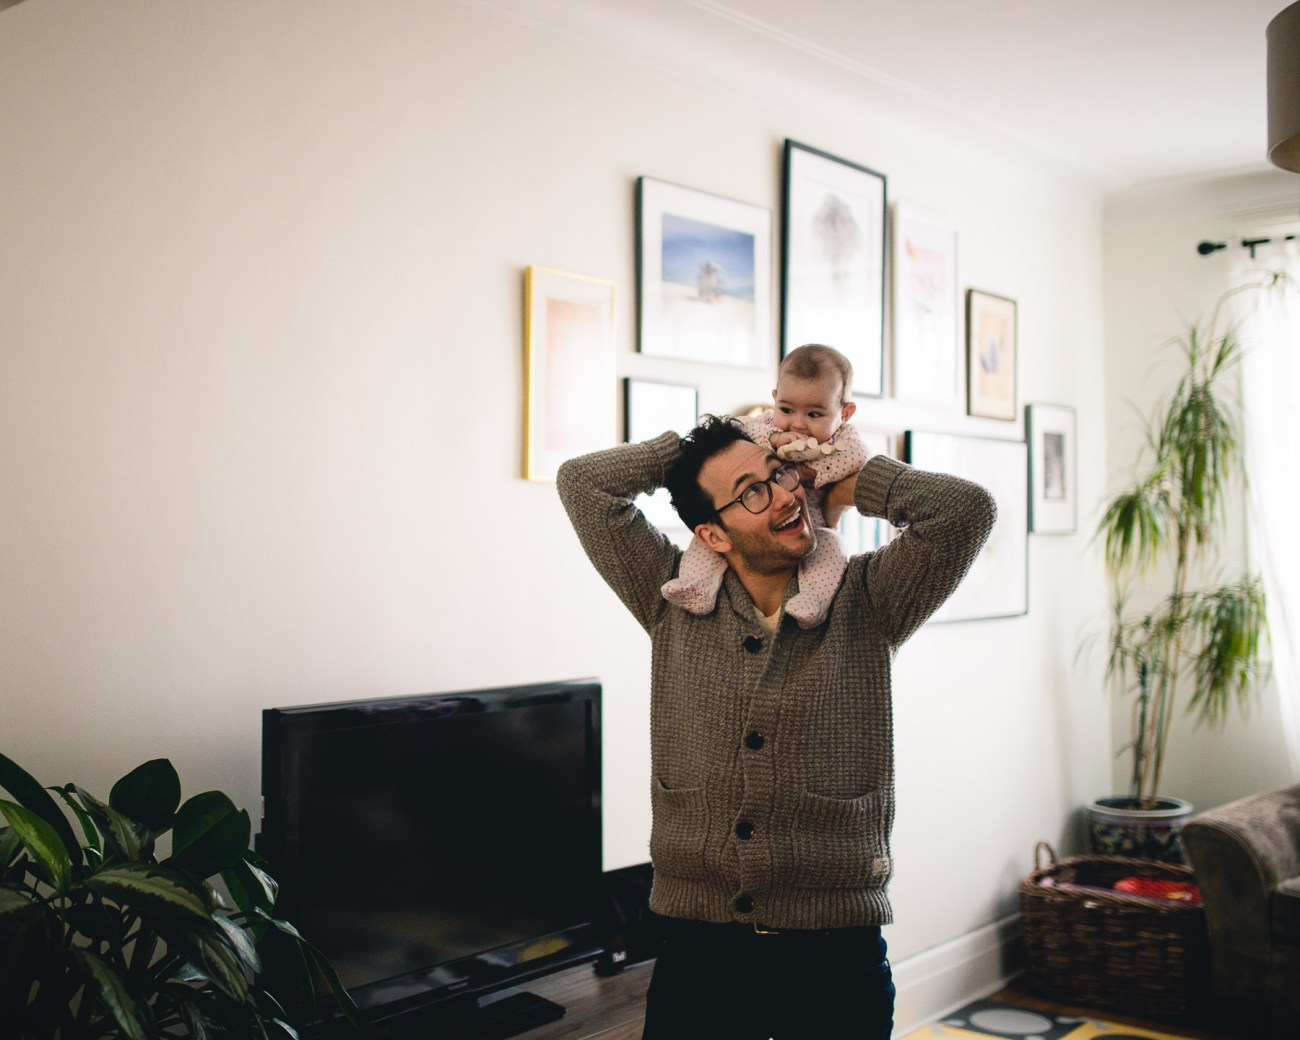 NDG Family Photographer, NDG Photographer, NDG Lifestyle Photography